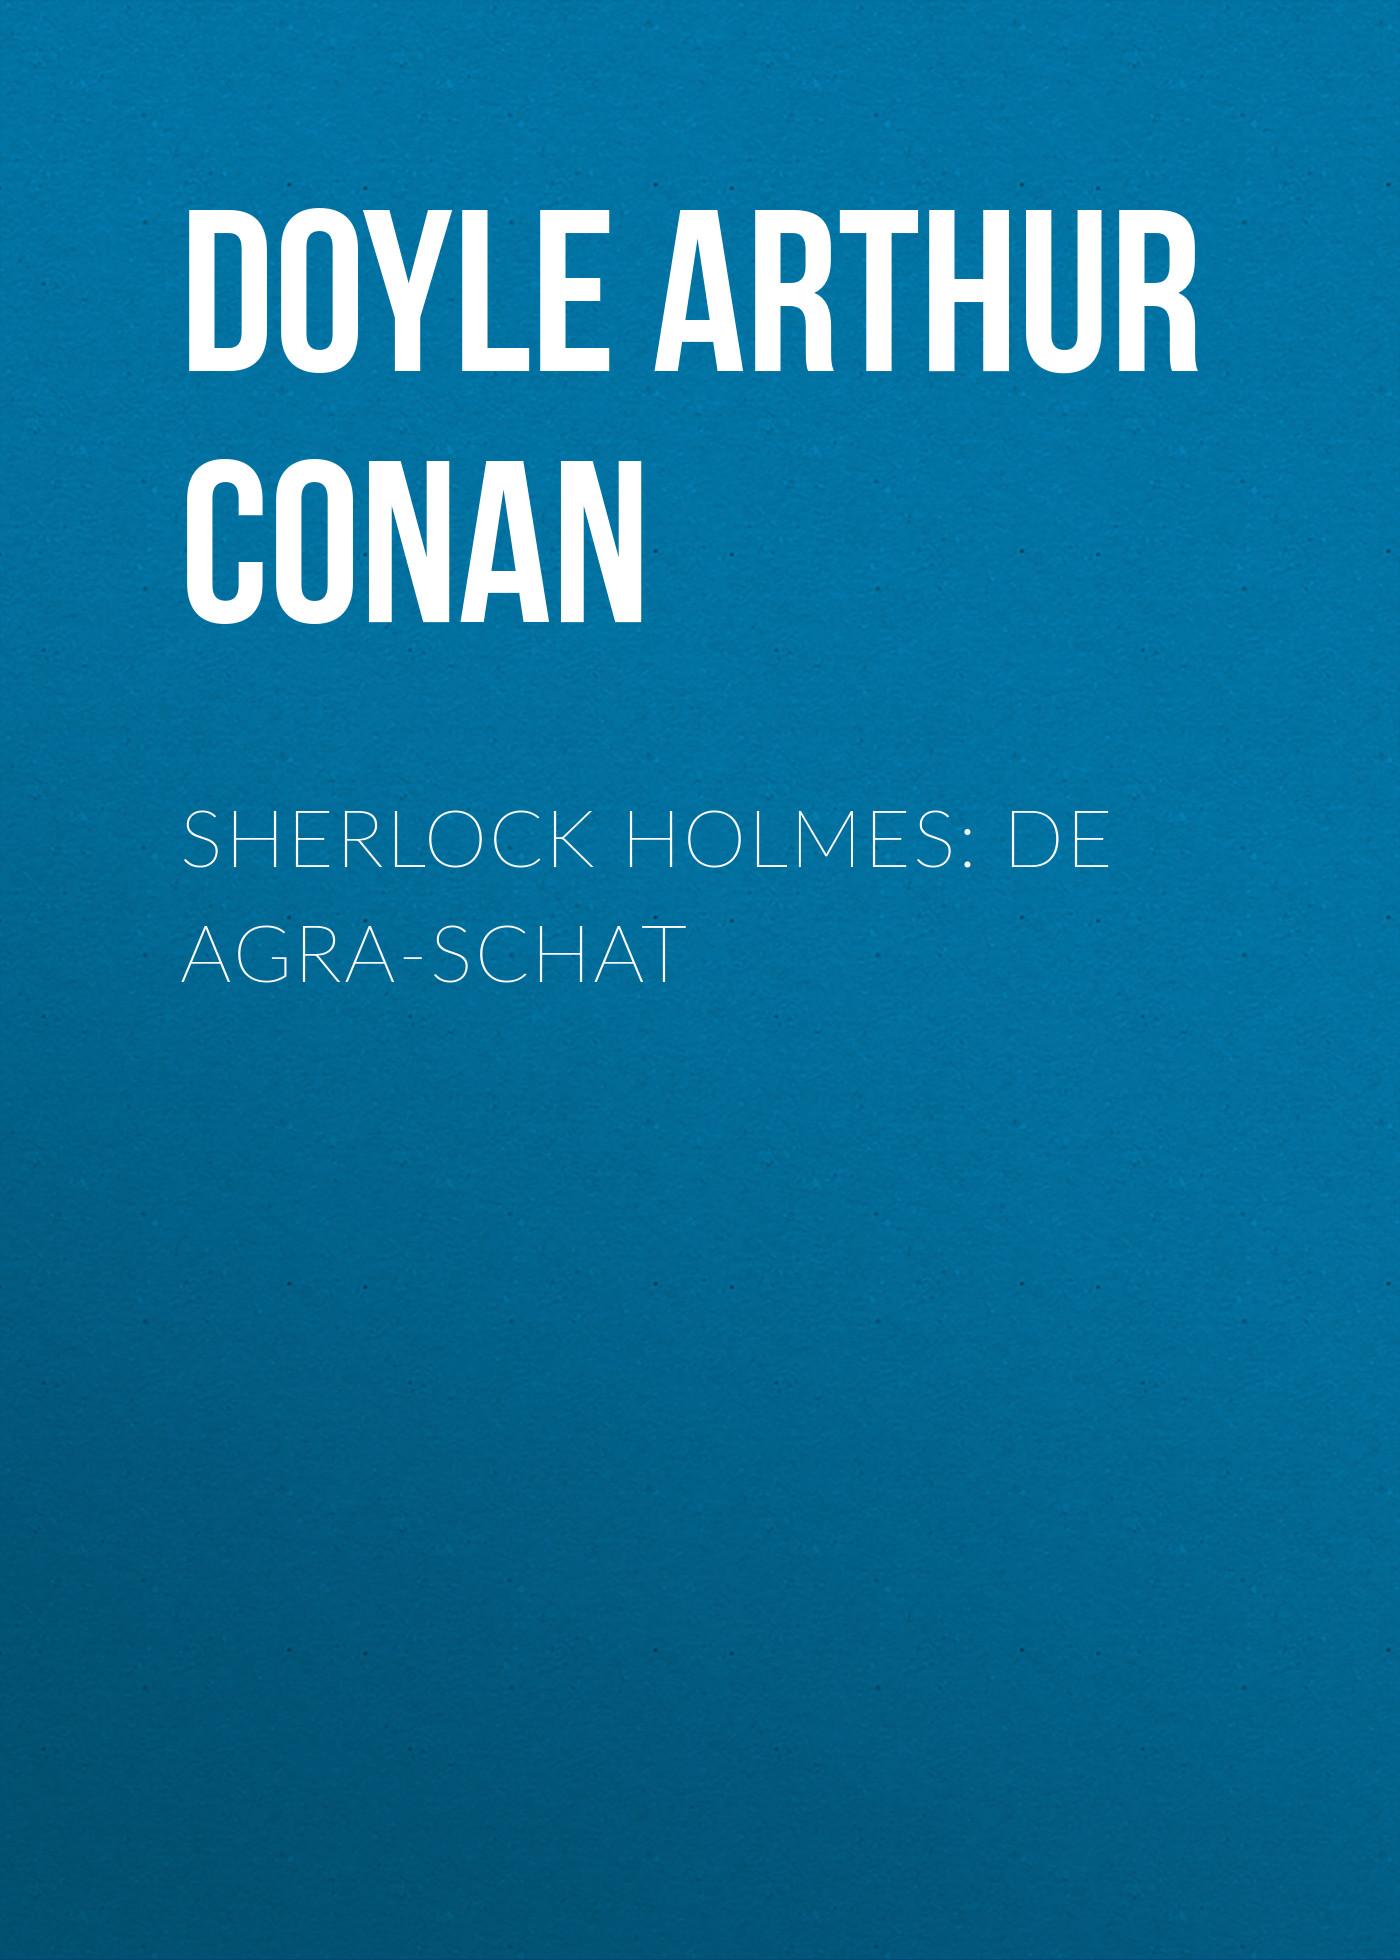 Doyle Arthur Conan Sherlock Holmes: De Agra-Schat стоимость